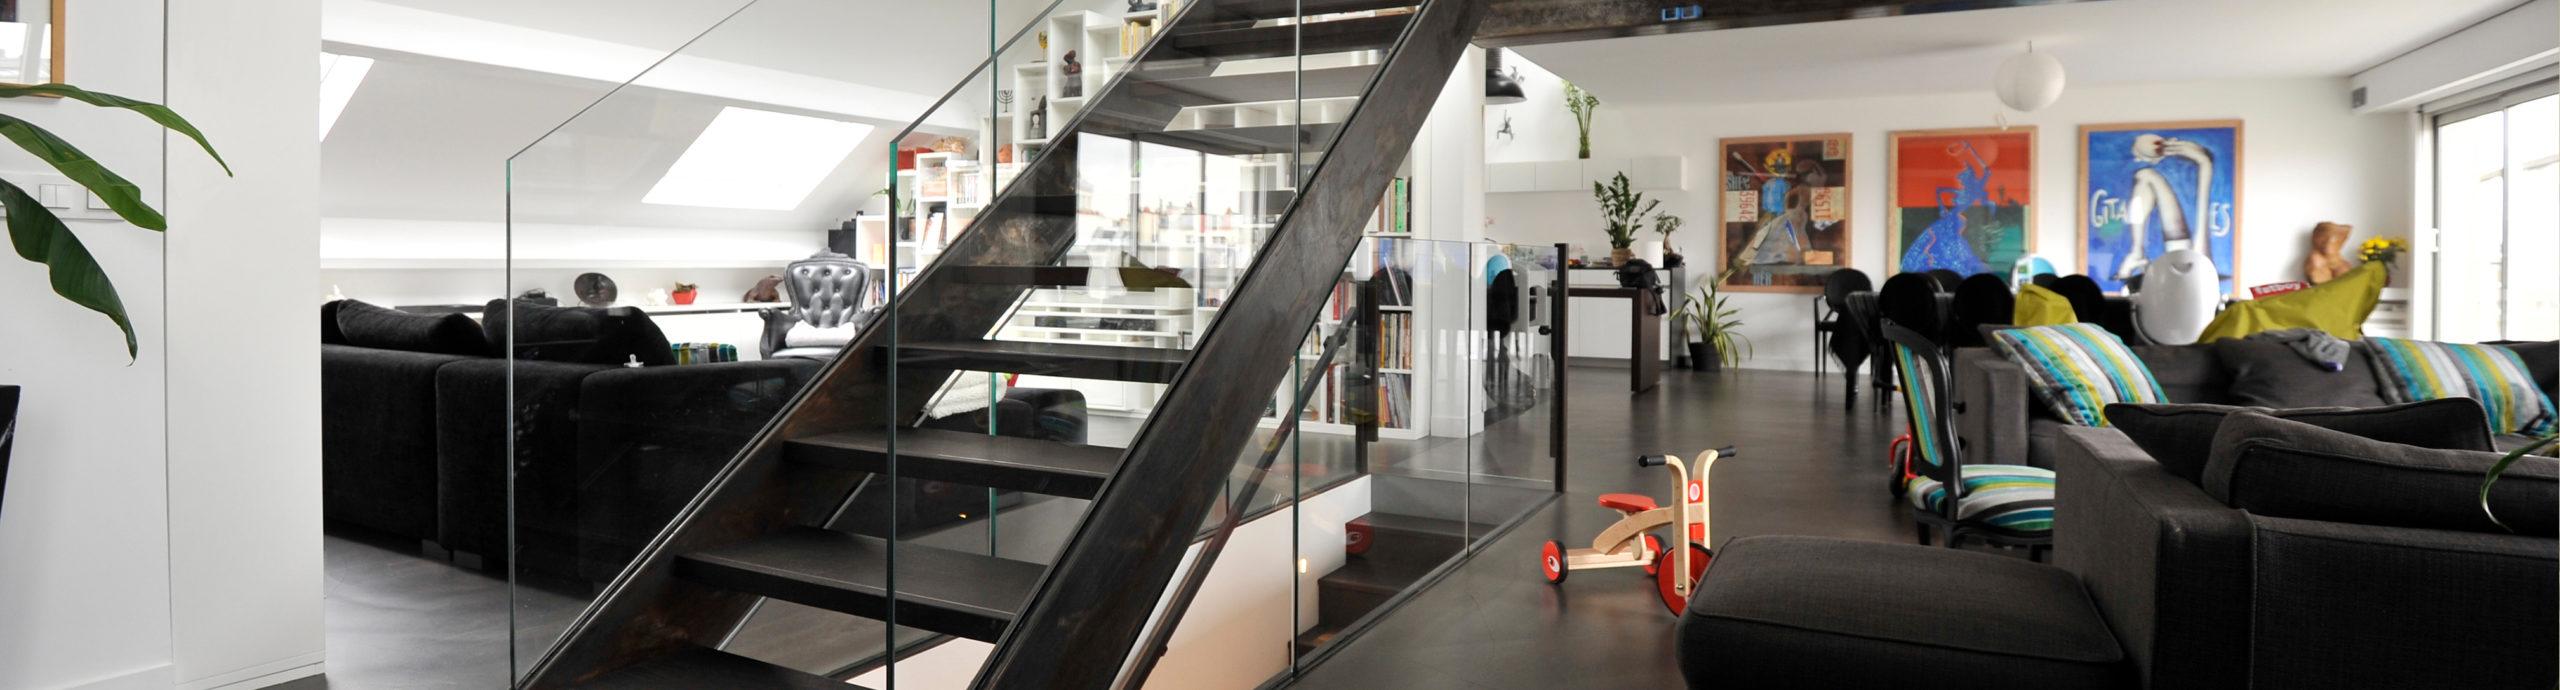 escalier sur mesure métallique design